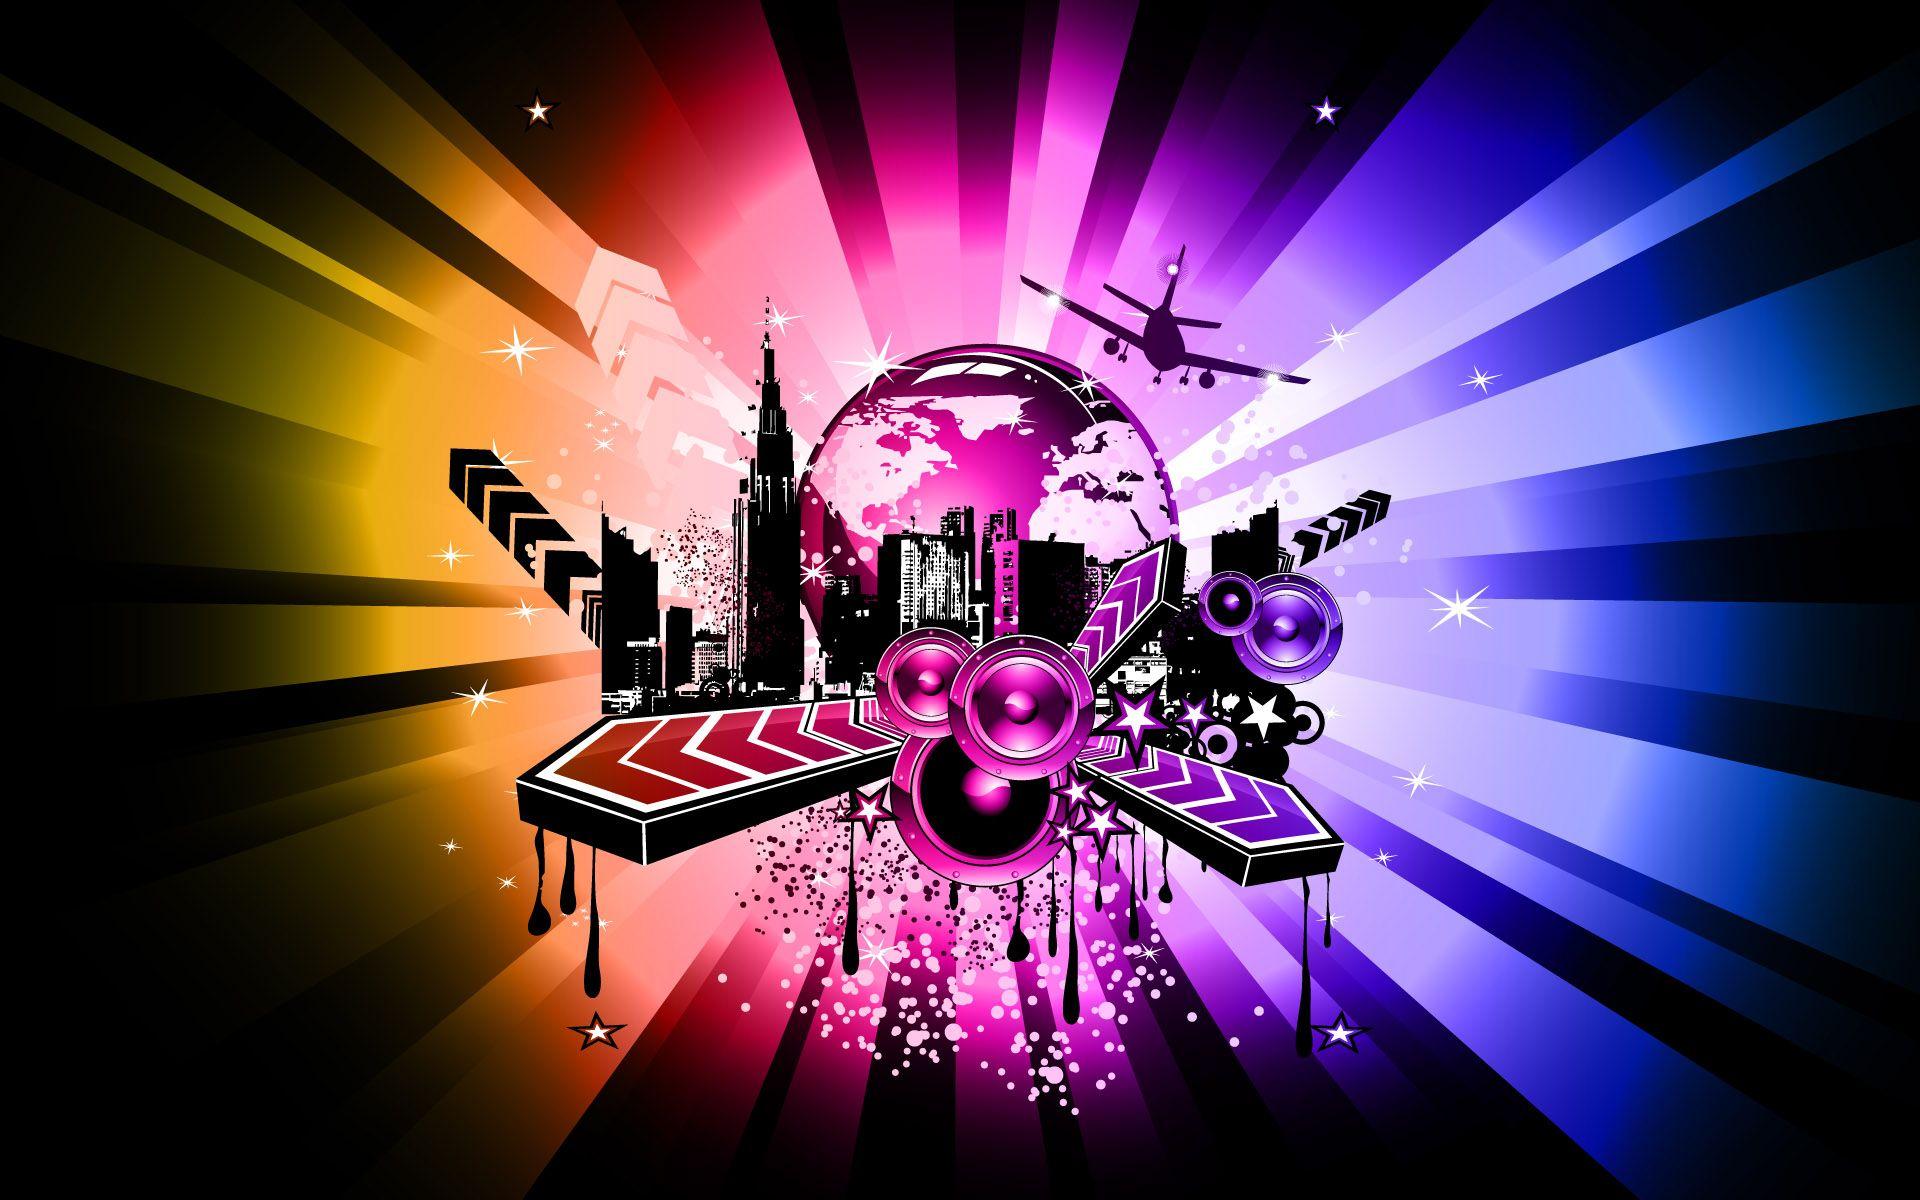 Good Wallpaper Music Violet - c15863368062b9c475767feeaf9fe268  Snapshot_866290.jpg